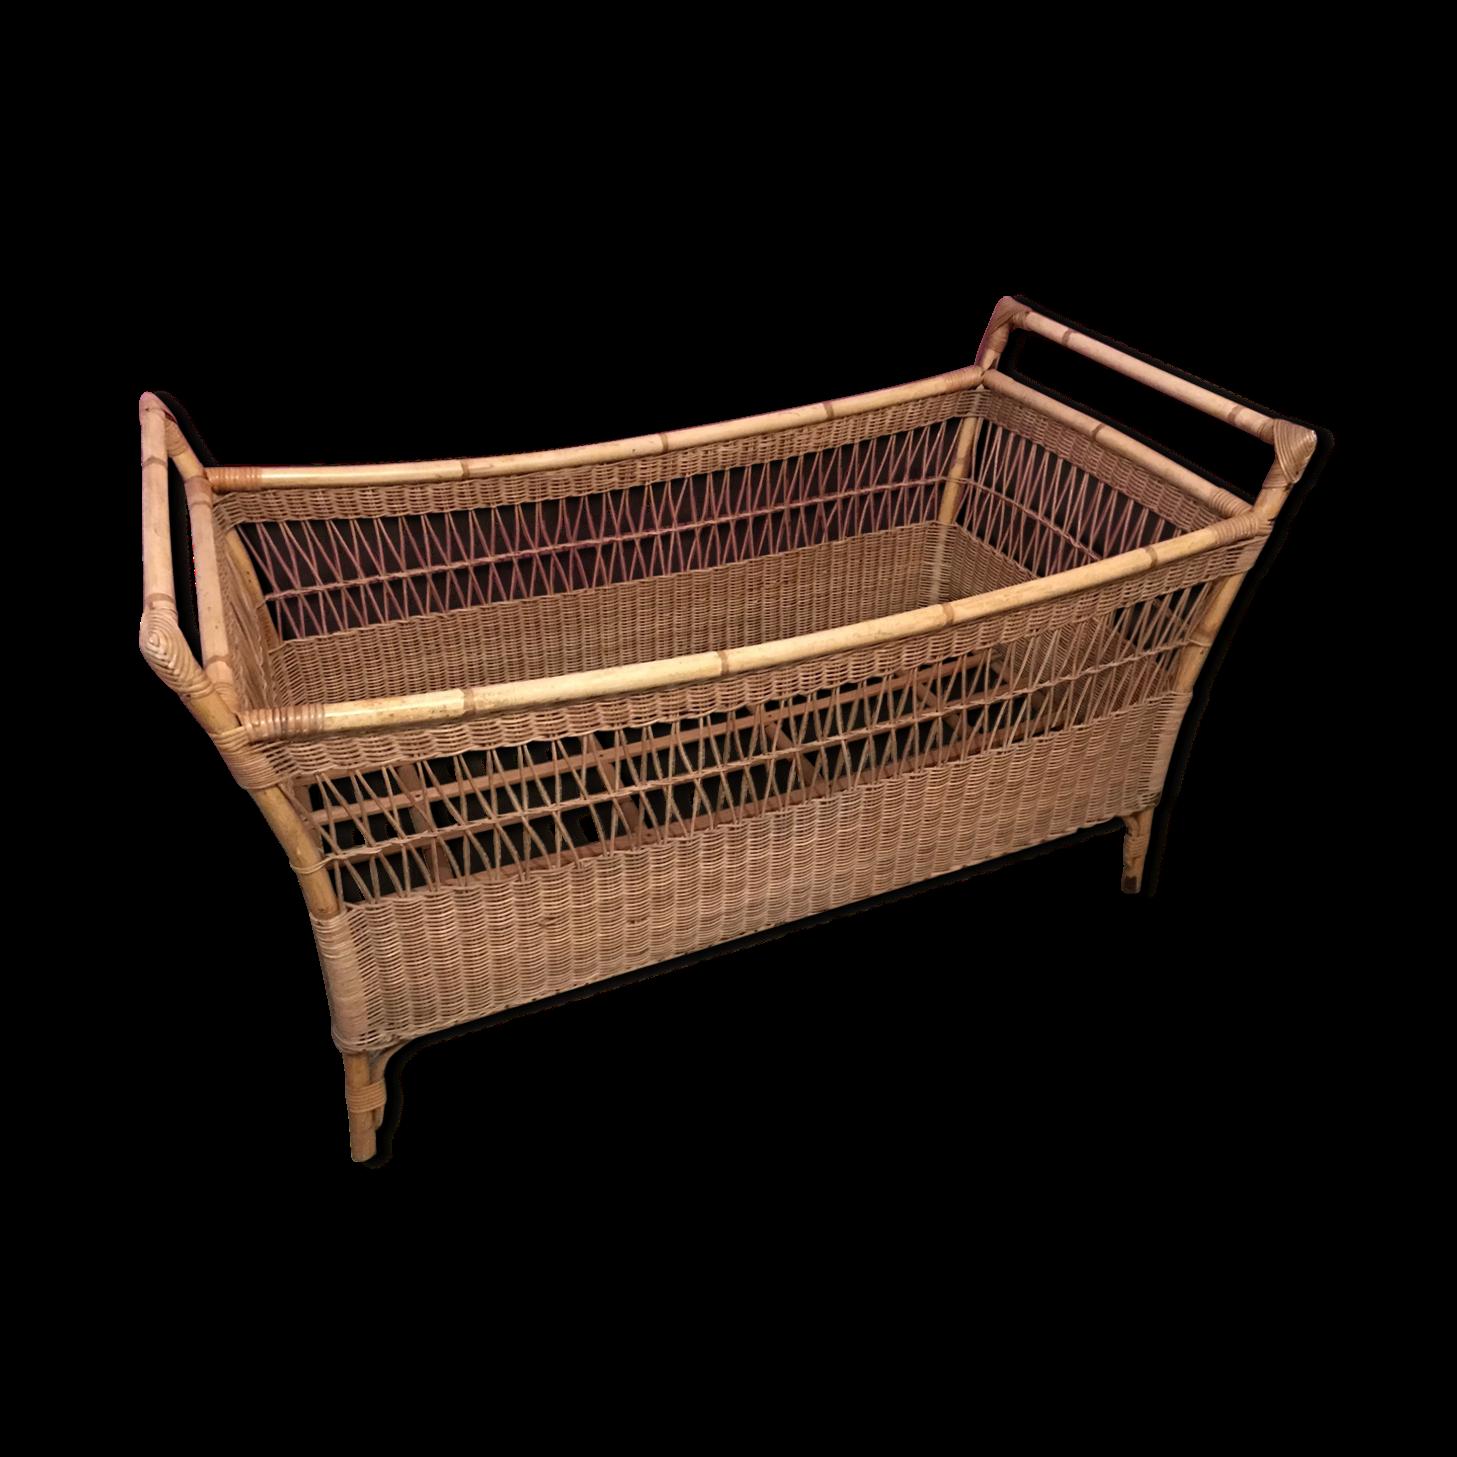 lit en rotin beautiful lit rotin vintage lit corbeille. Black Bedroom Furniture Sets. Home Design Ideas